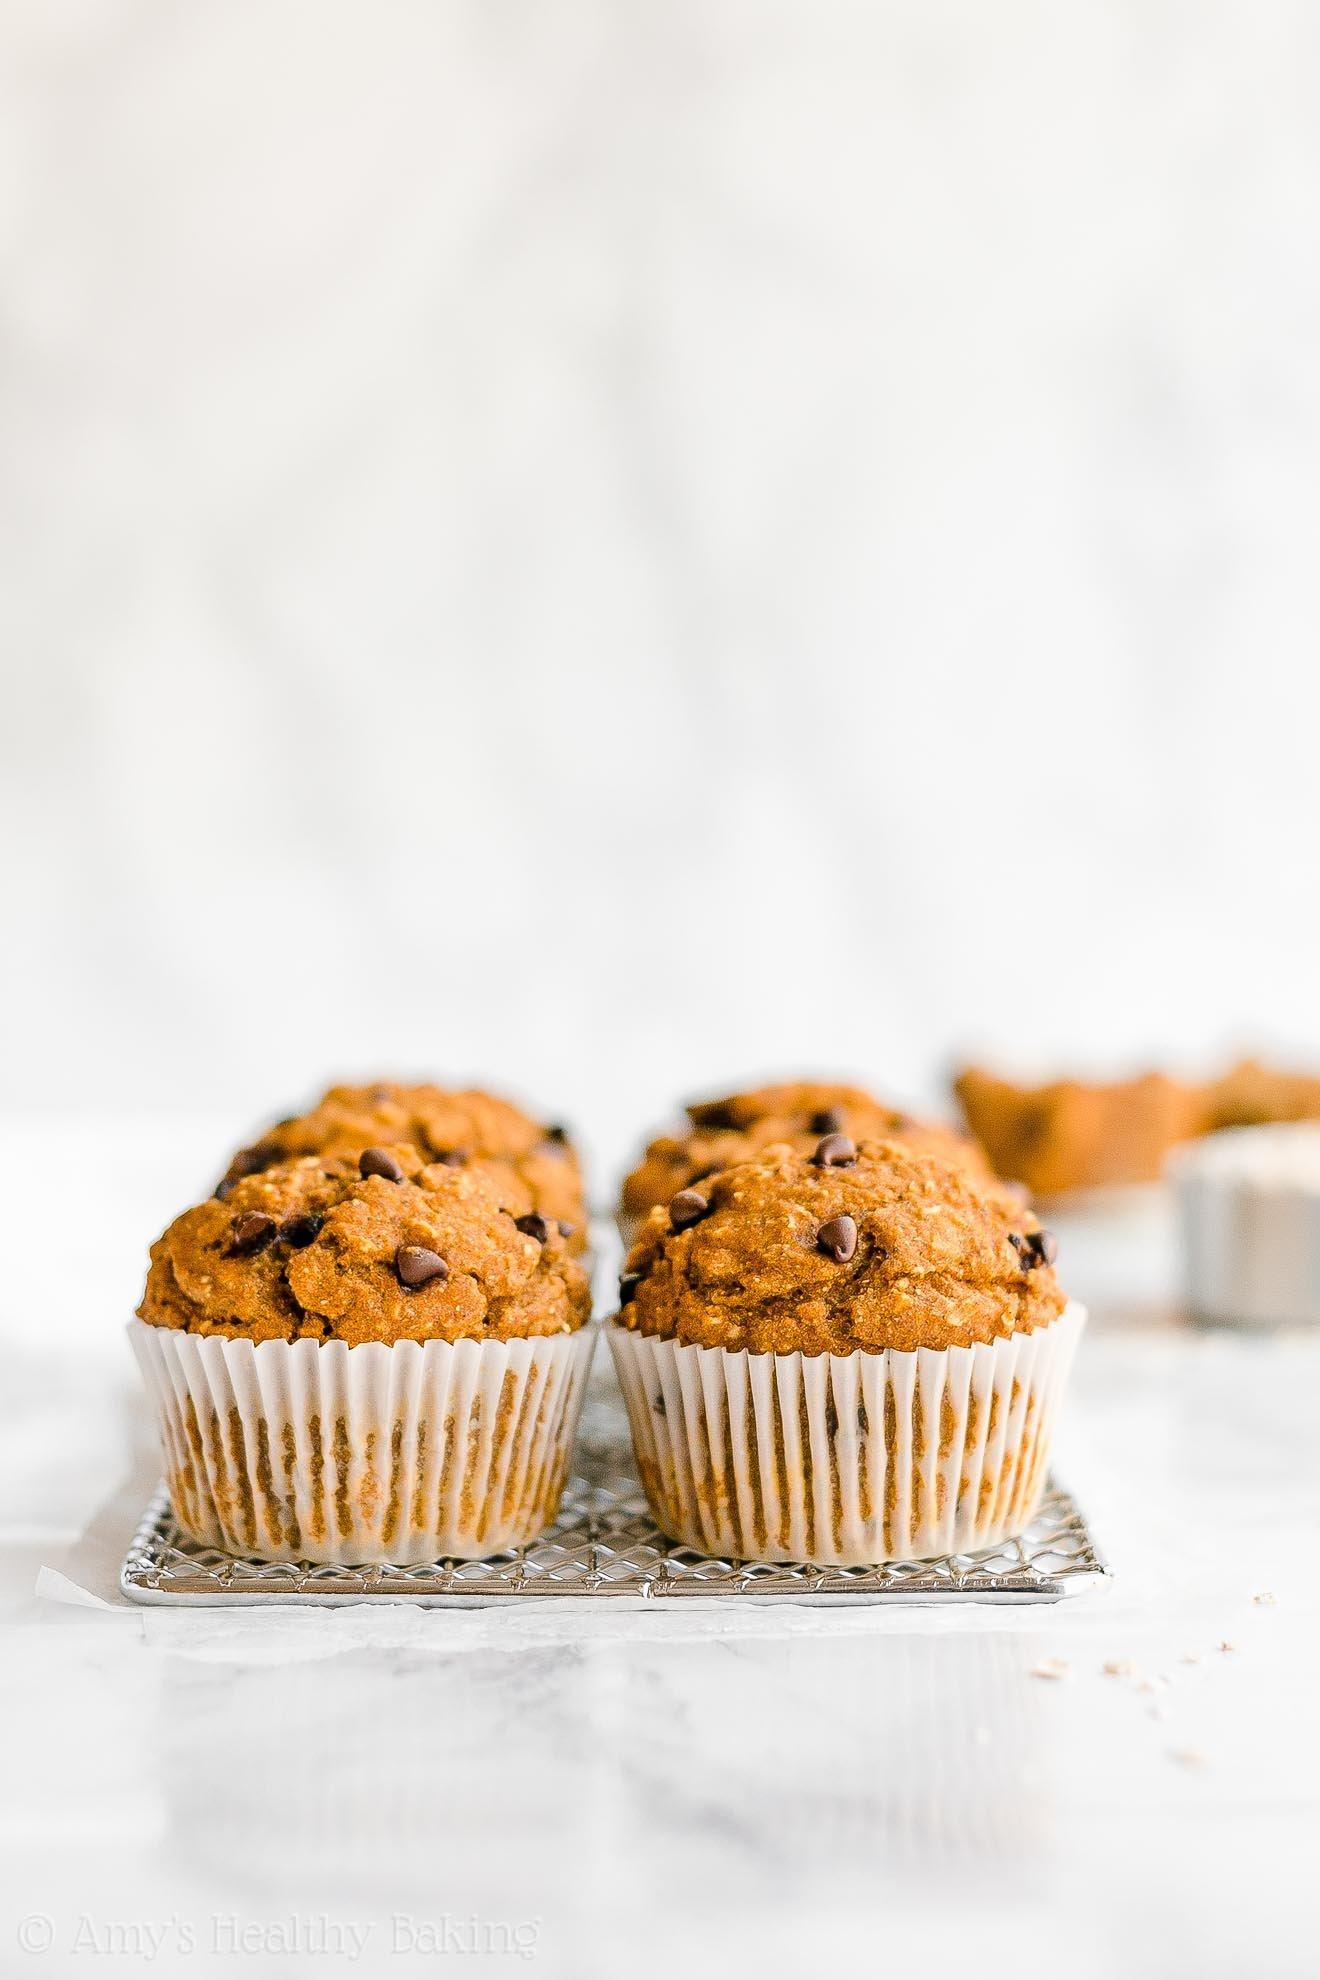 Best Healthy Low Calorie Moist Pumpkin Chocolate Chip Oatmeal Muffins